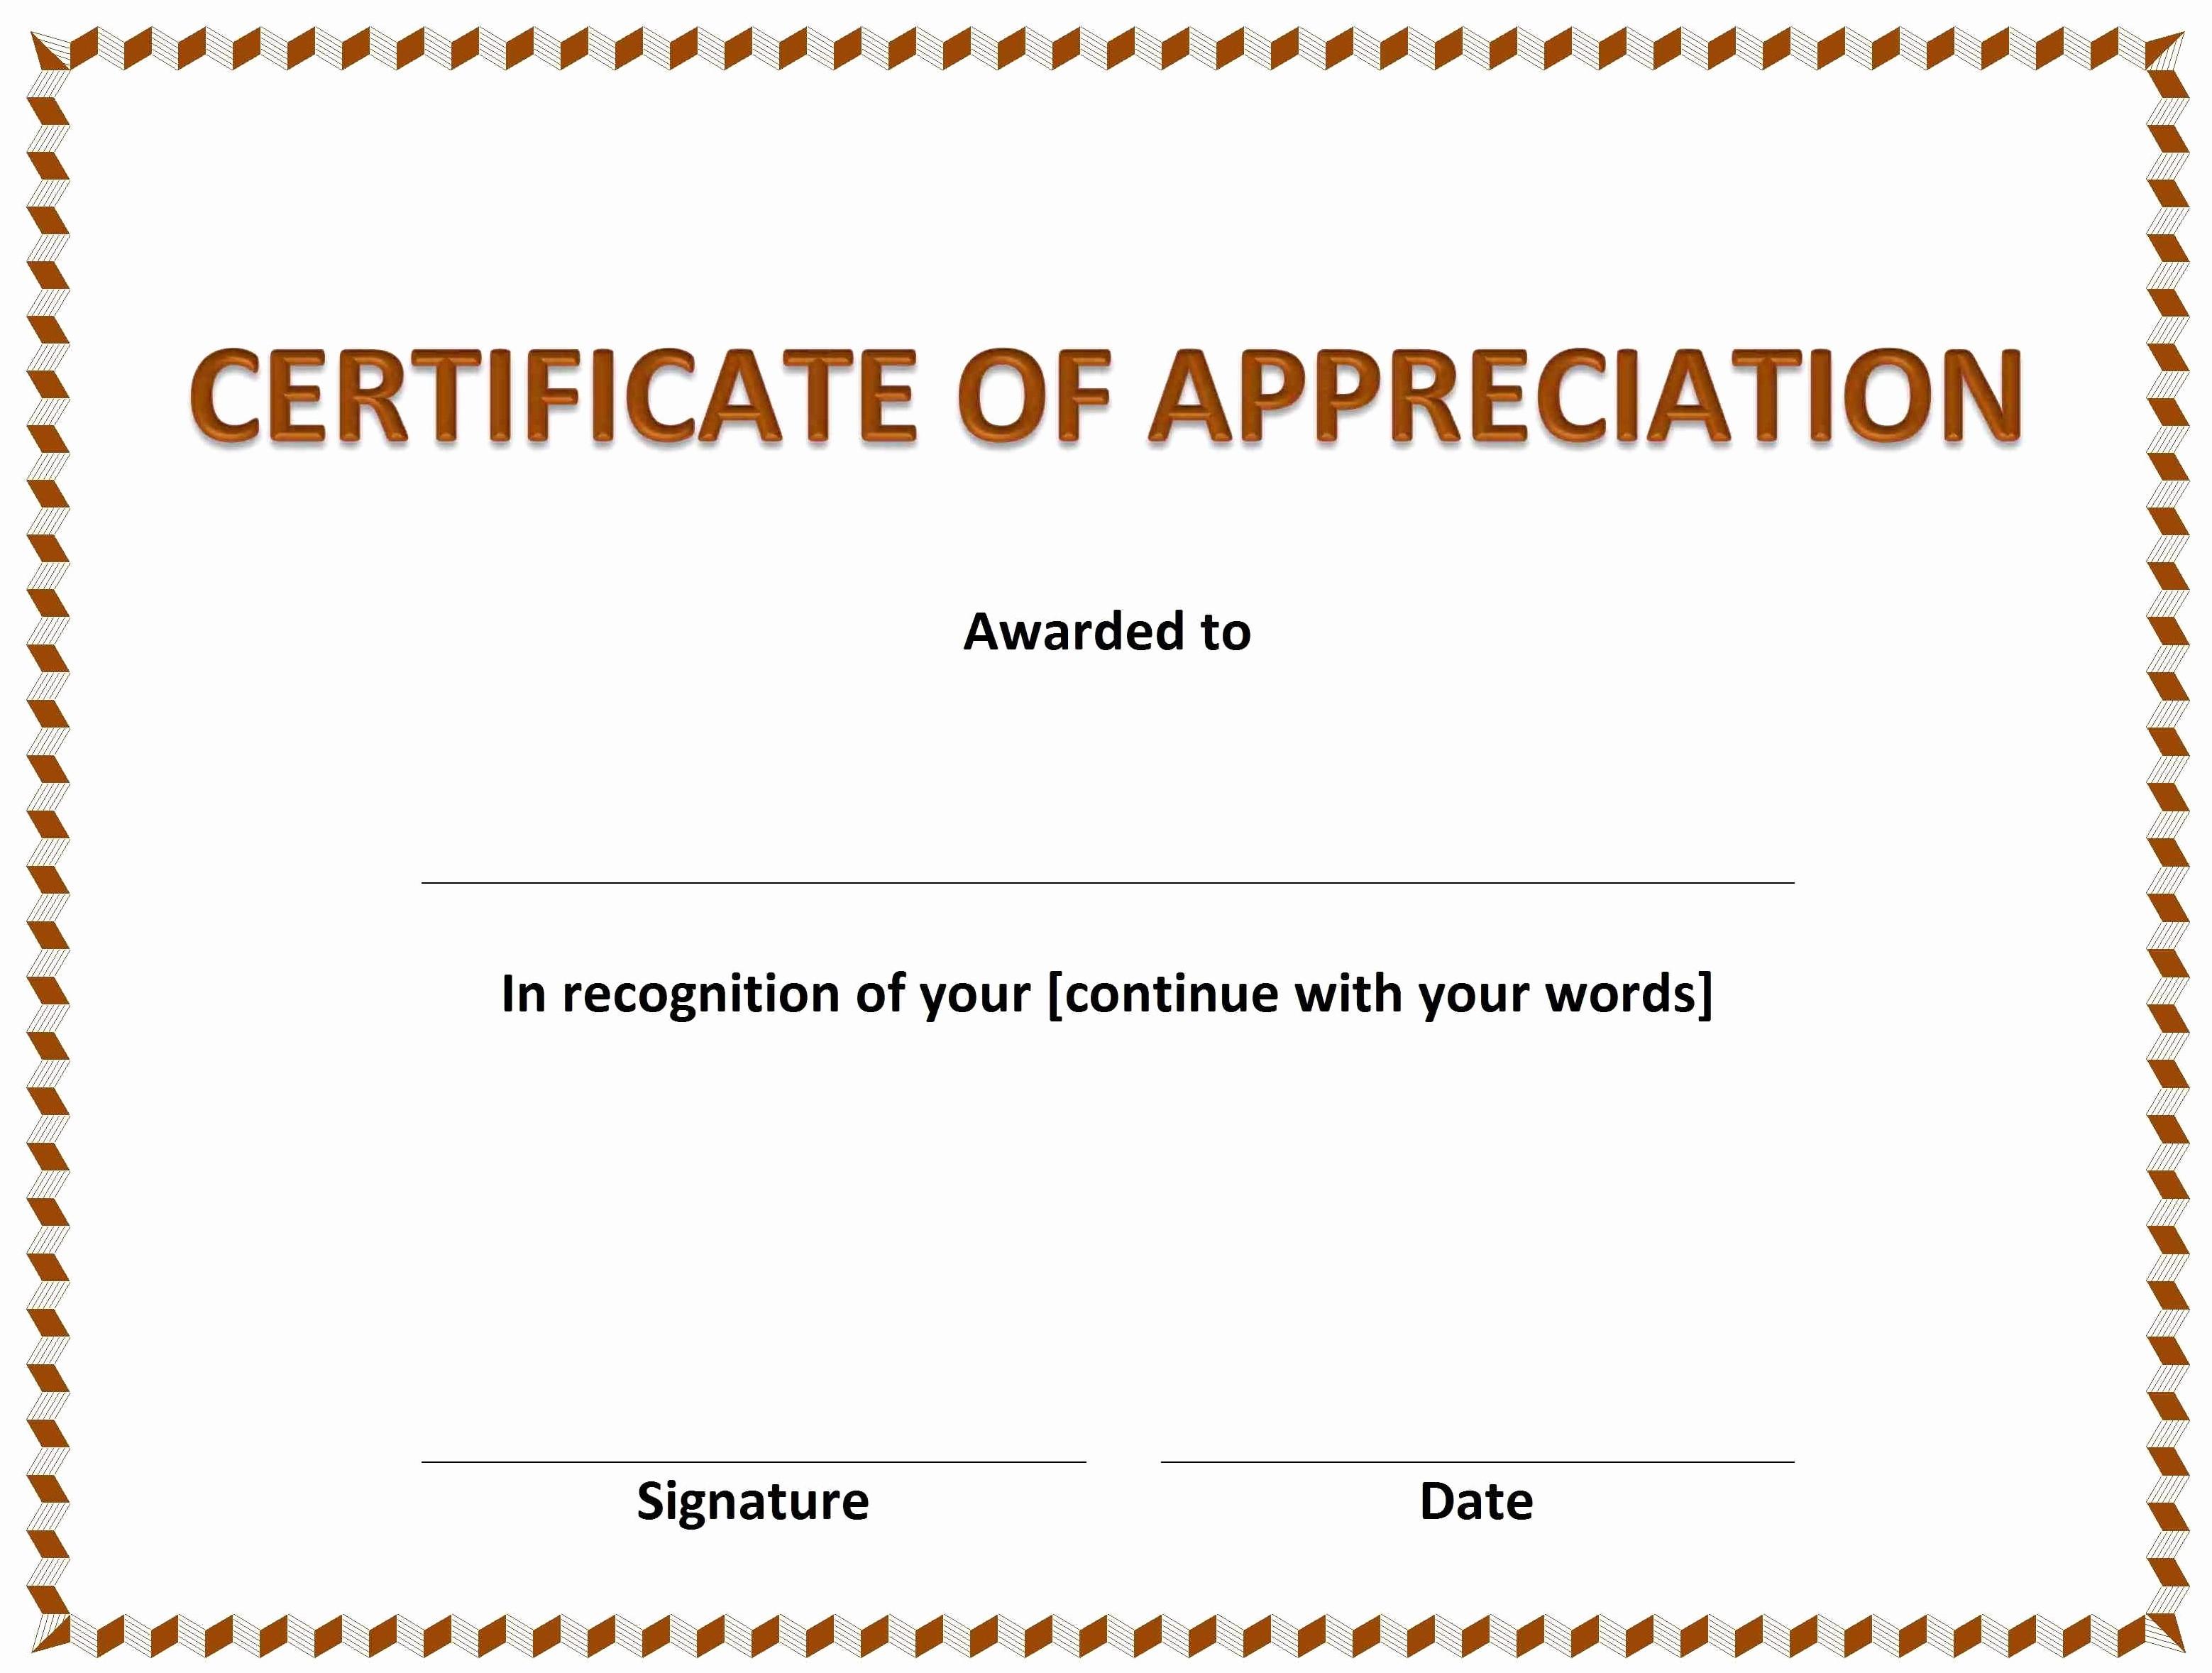 Free Download Certificate Of Appreciation Fresh Certificate Appreciation Templates Free Download